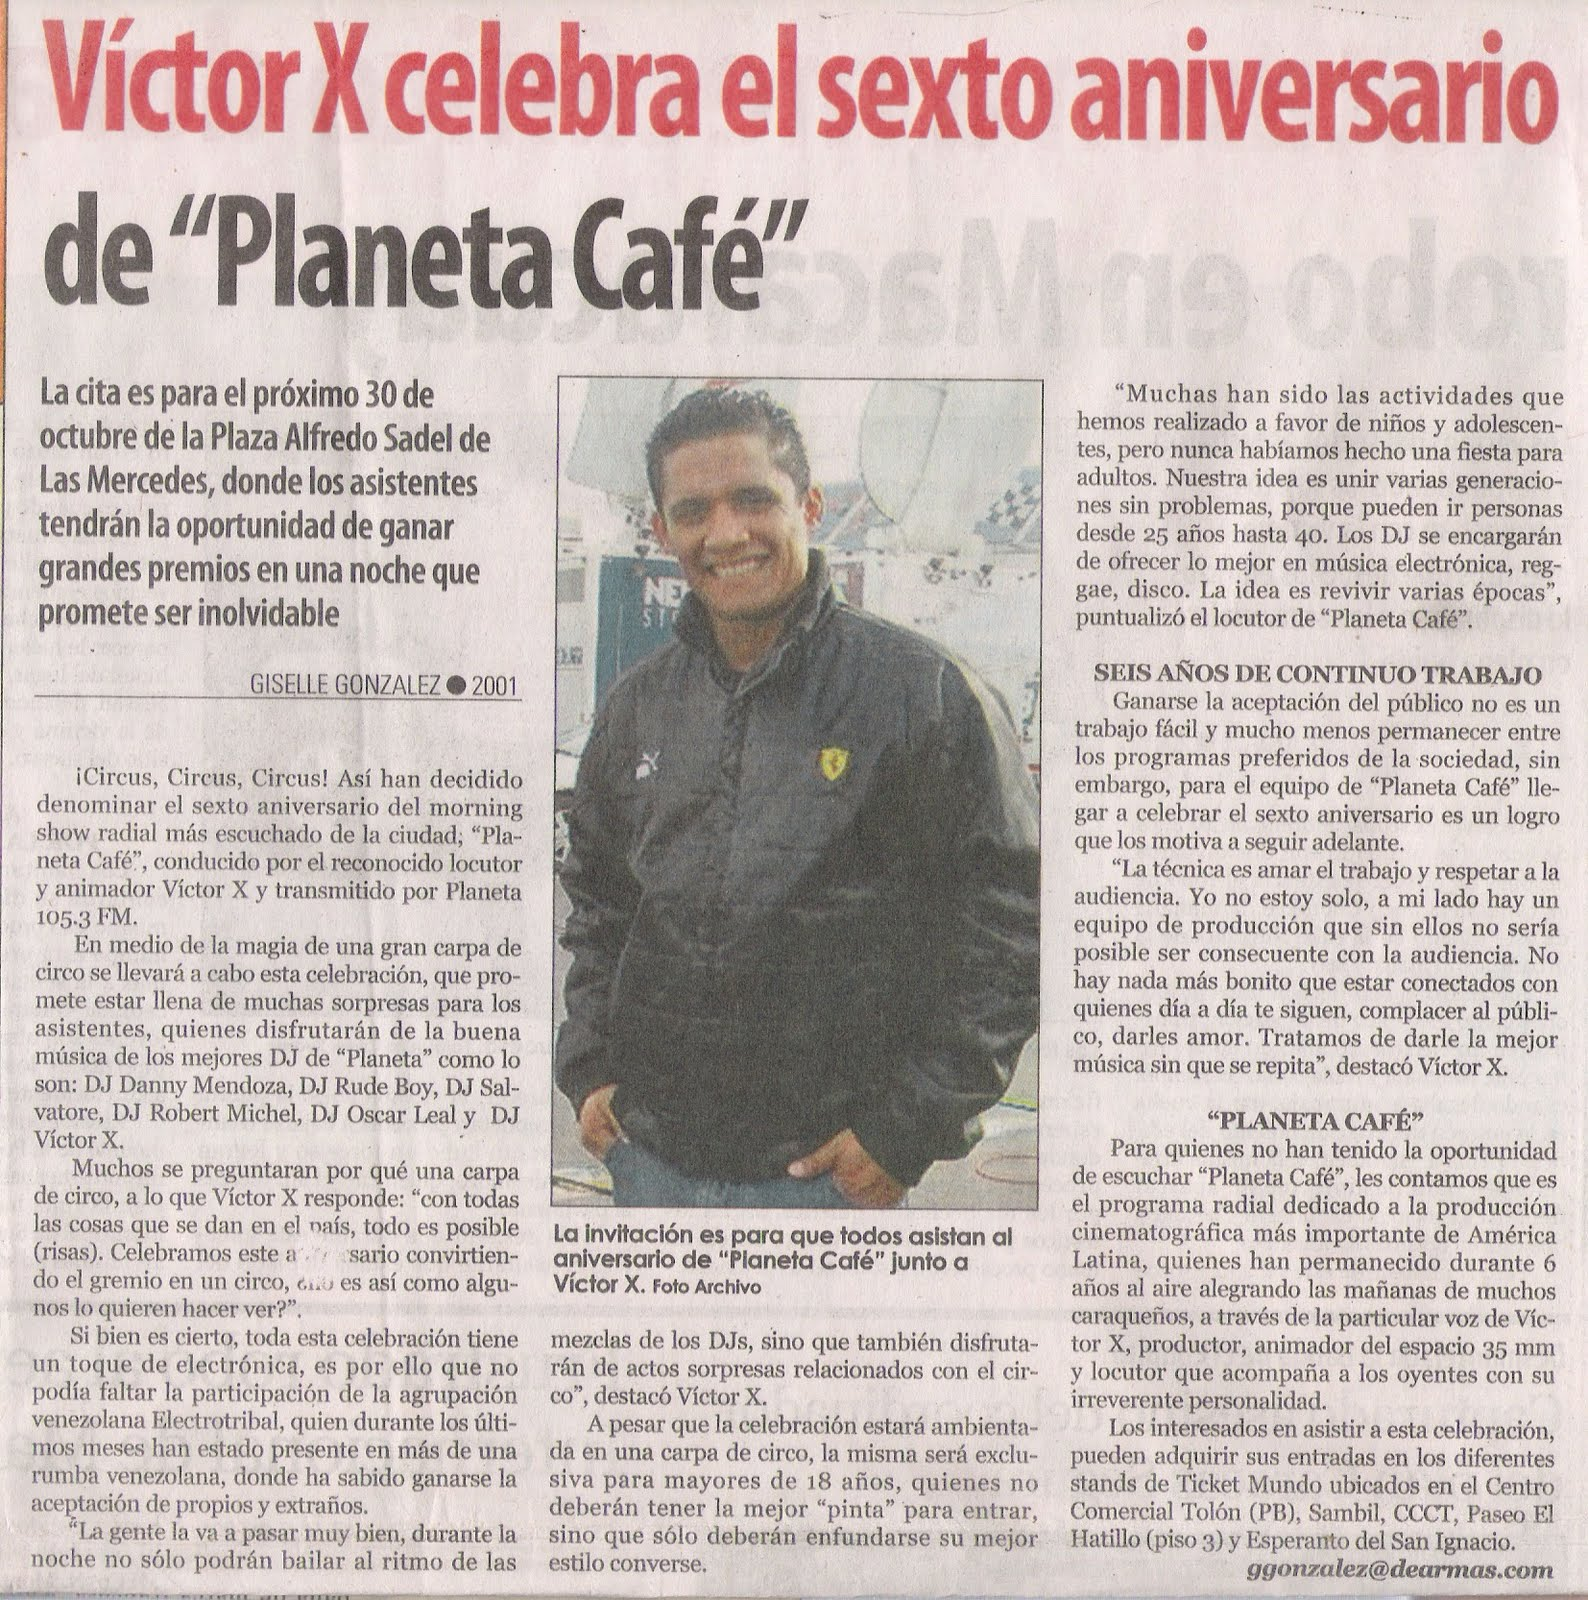 http://3.bp.blogspot.com/_bNm_DuCmoEU/TMYiVmxk7-I/AAAAAAAAIo0/4z5UaFZjjjk/s1600/6+a%C3%B1os+de+Planeta+Cafe+Diario+2001.jpg